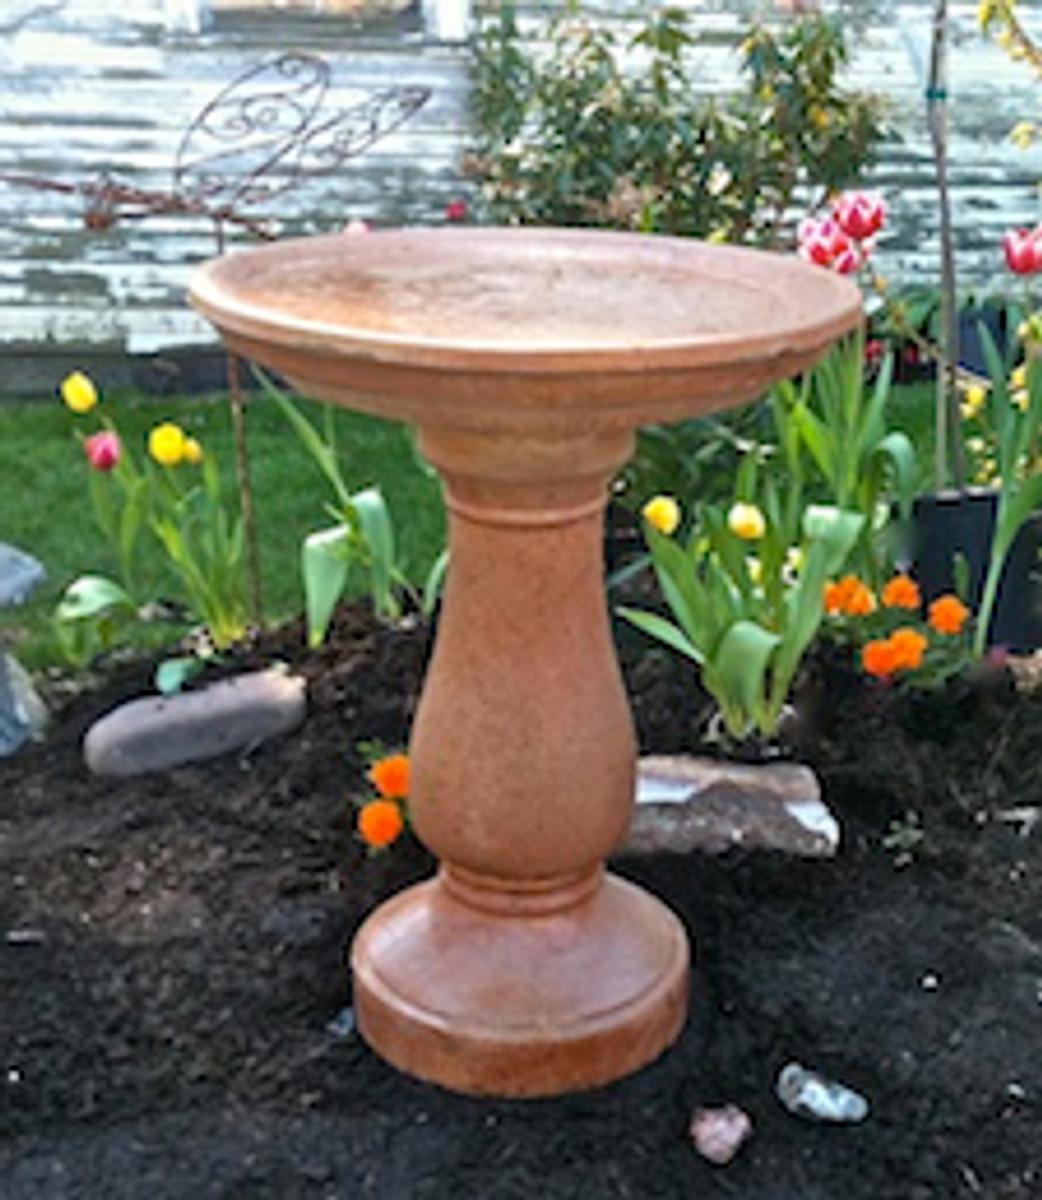 Simple Style birdbath, cement, Simply Divine athena garden cast stone bird bath, two piece concrete bird bath, contemporary bird bath, concrete birdbath, terracotta birdbath